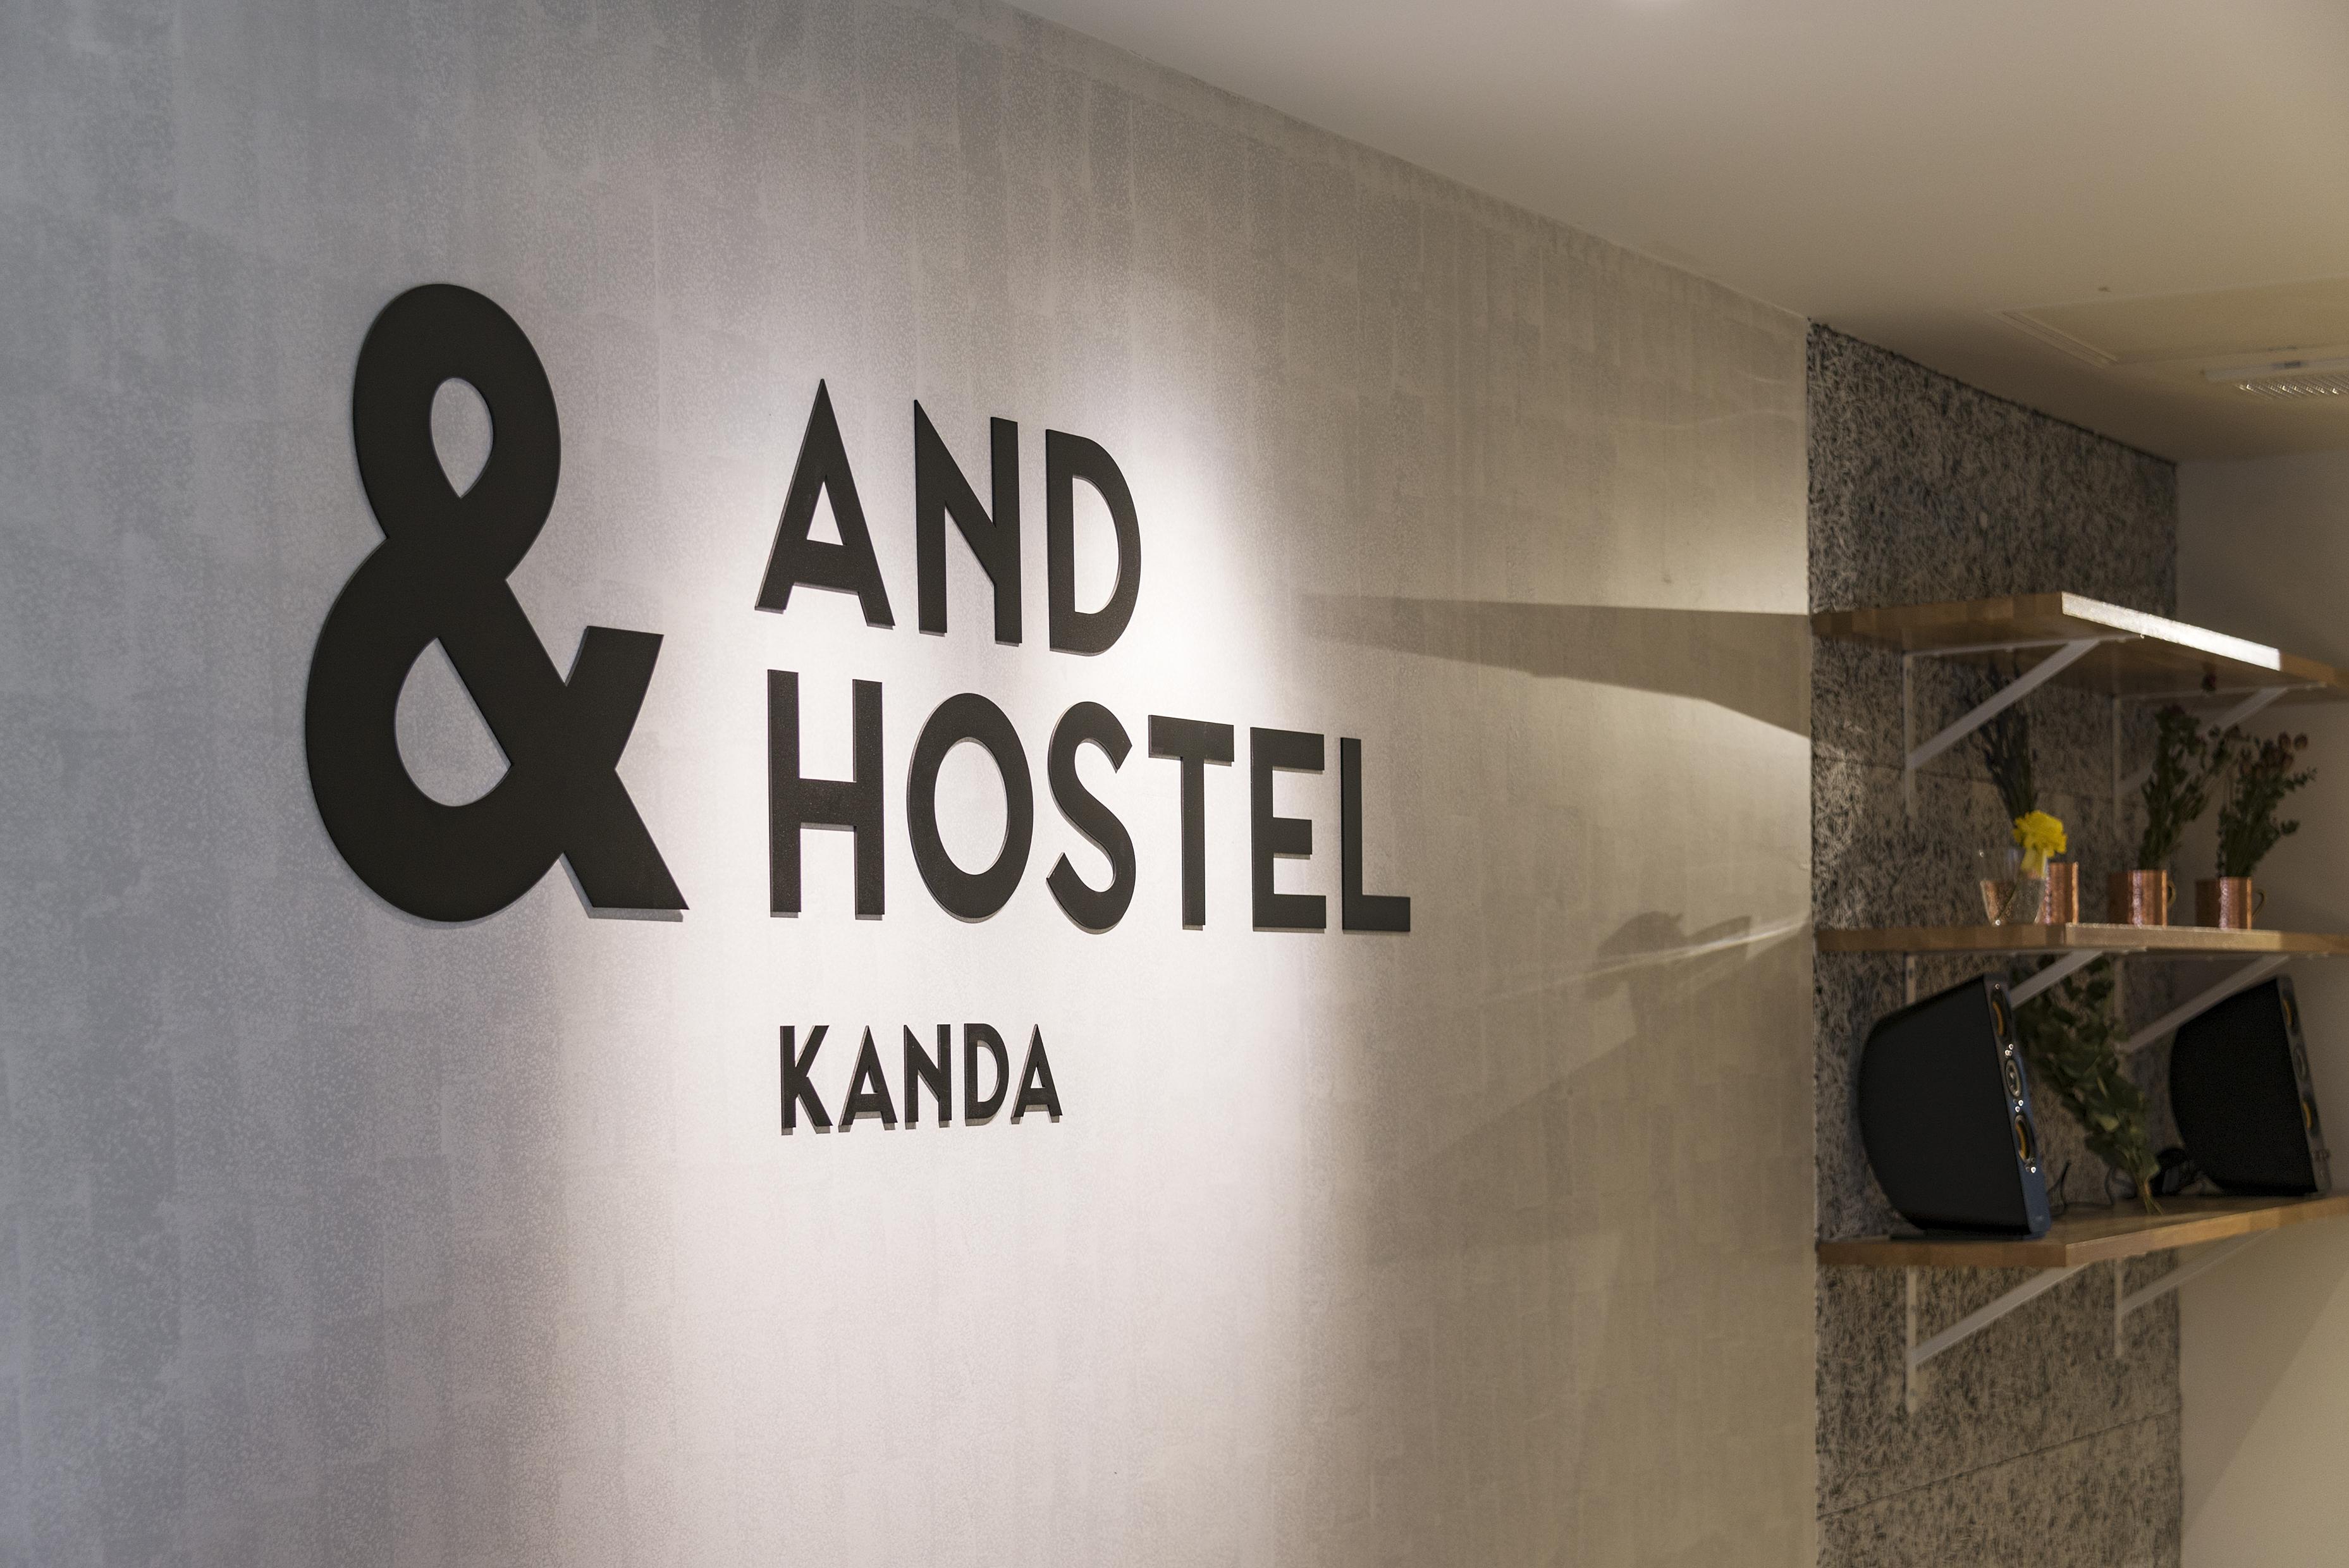 &And Hostel Kanda